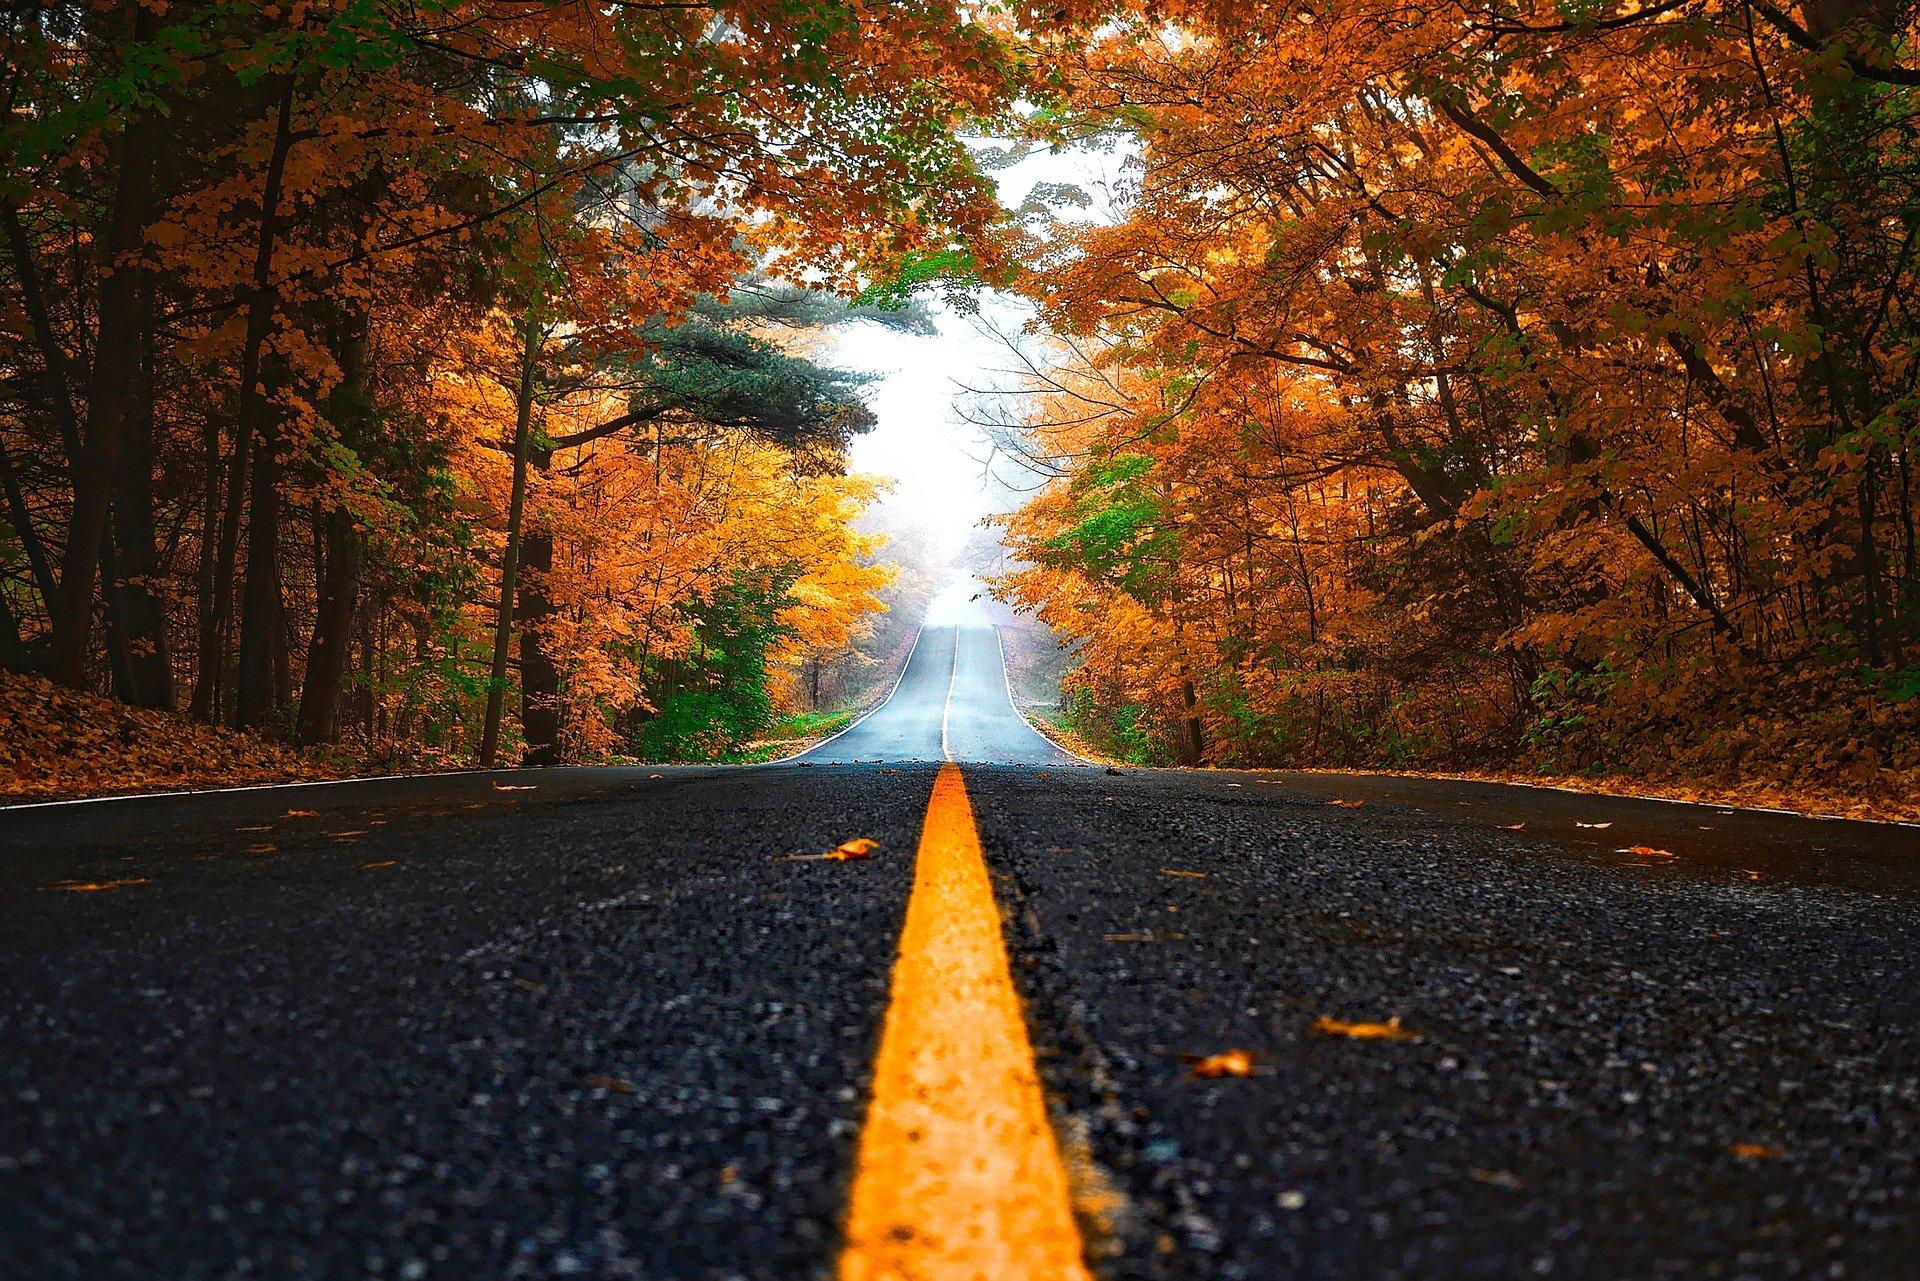 Sendeplan-Update zum Herbstanfang